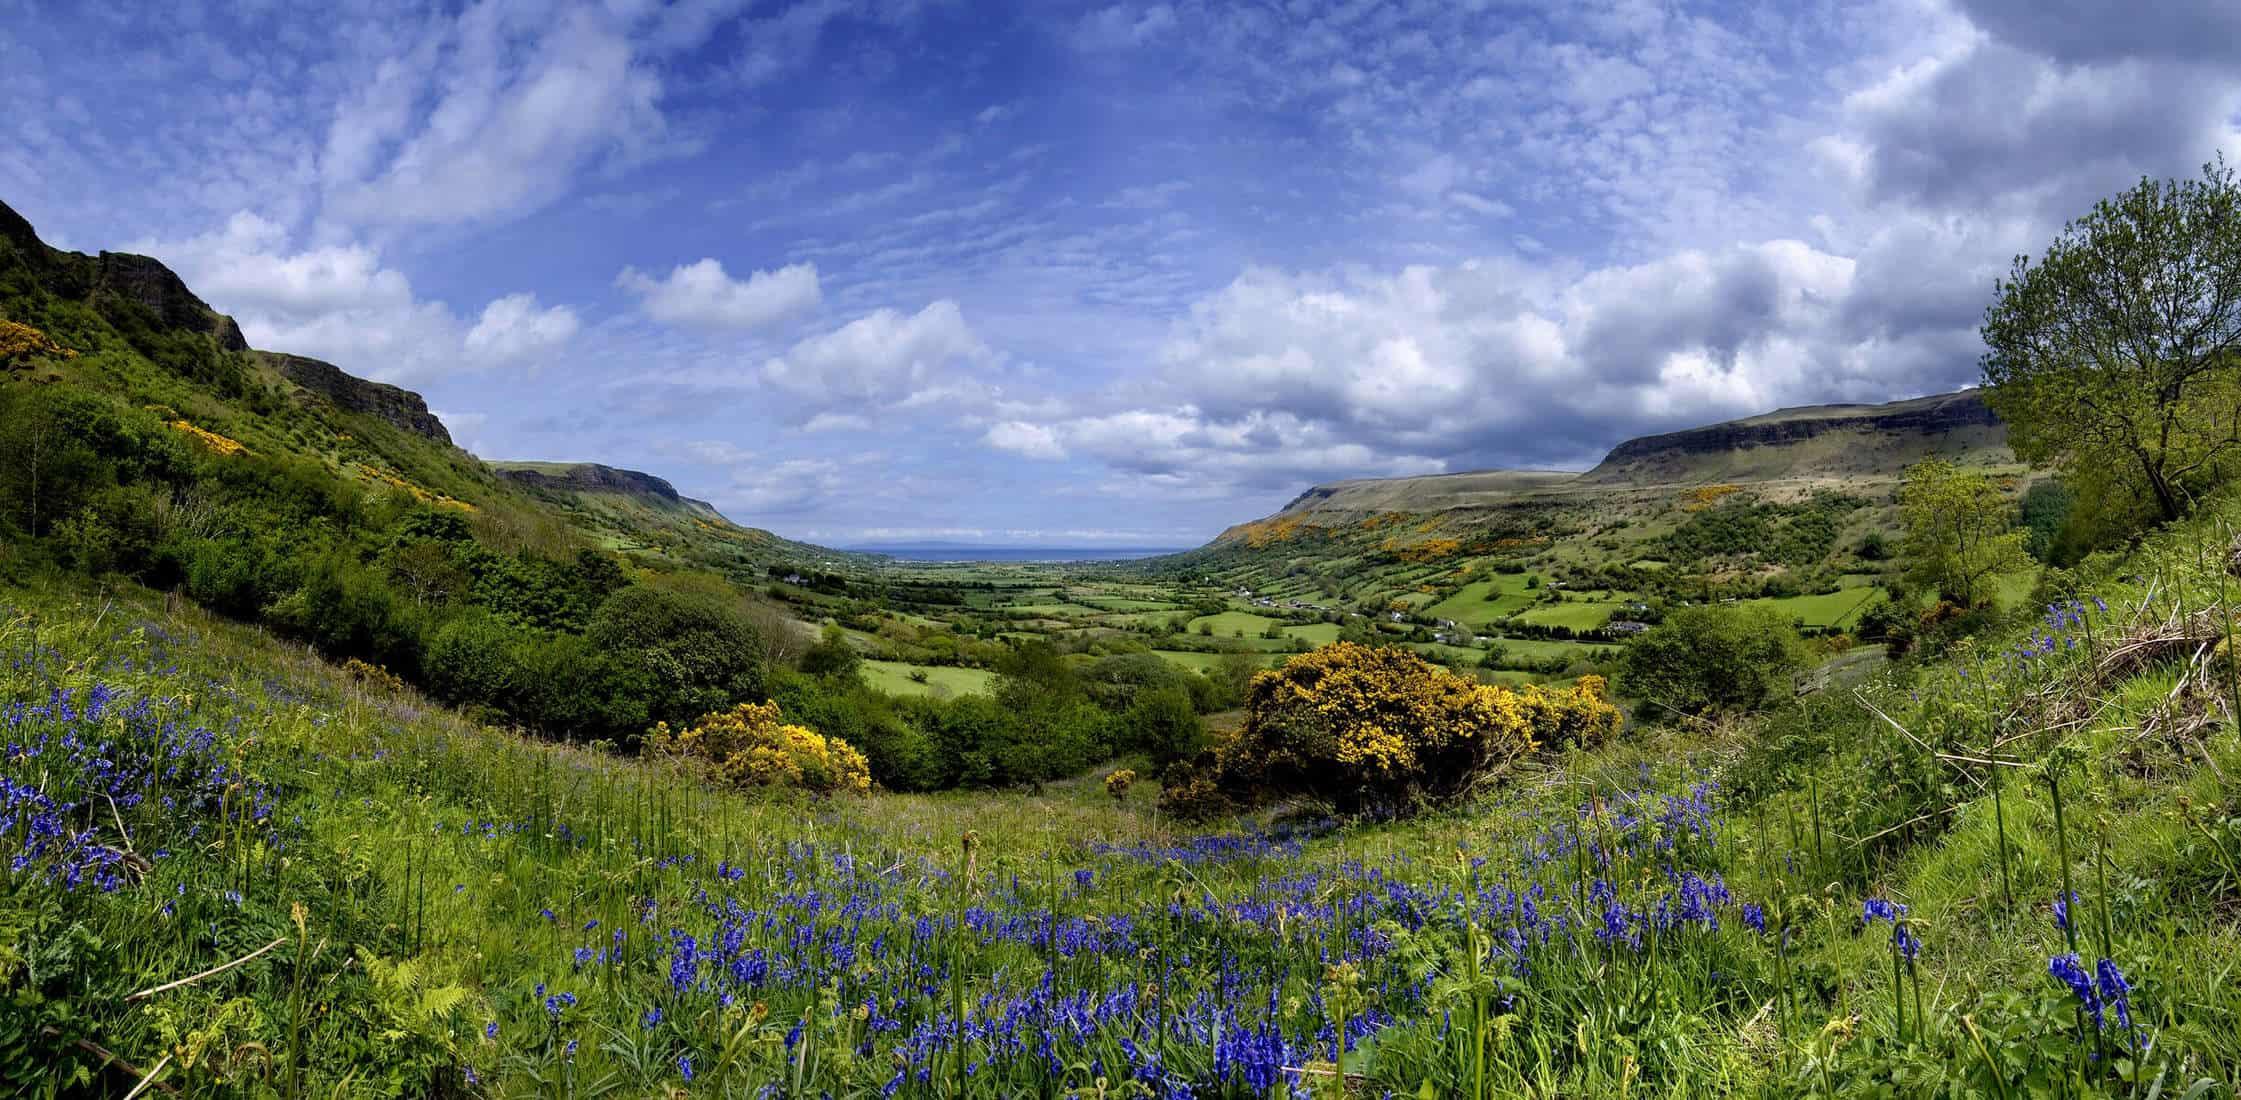 Glenariff, Co Antrim, Glens, Northern, Ireland